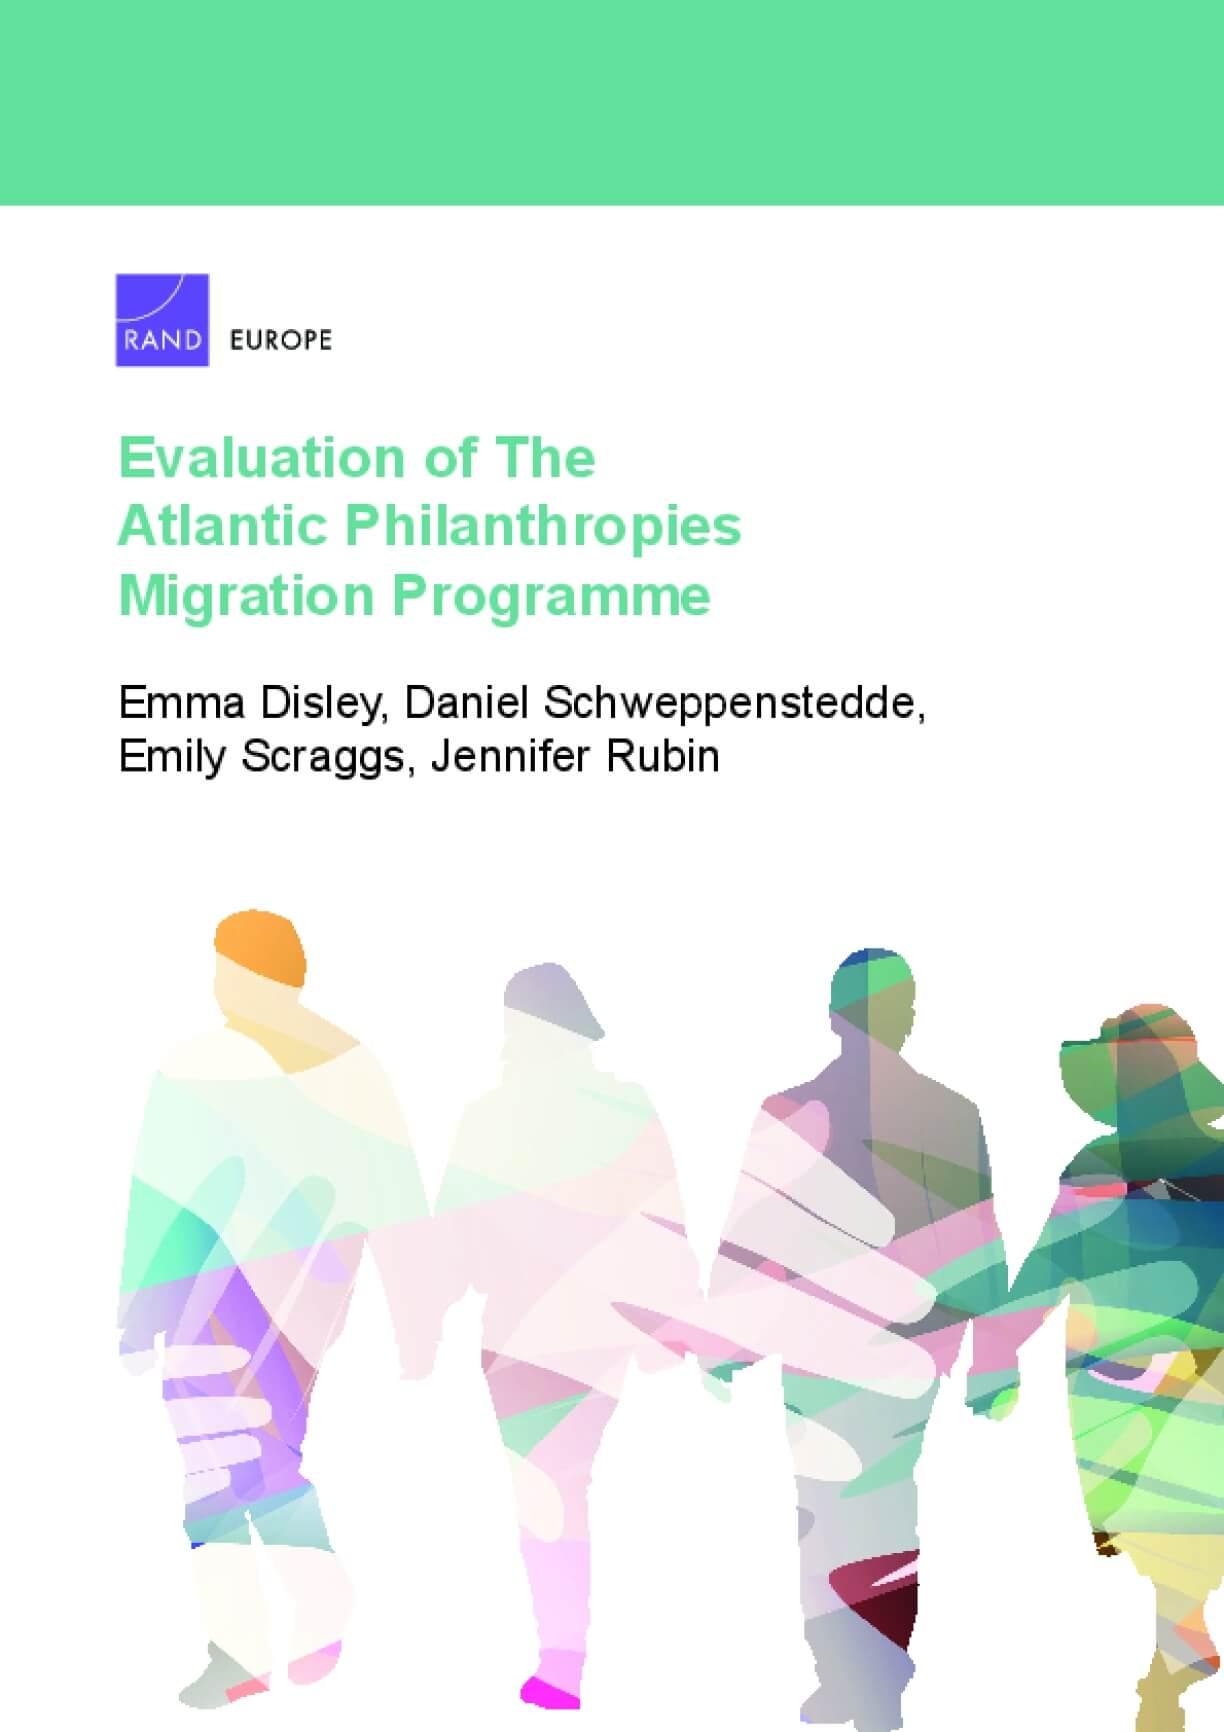 Evaluation of The Atlantic Philanthropies Migration Programme